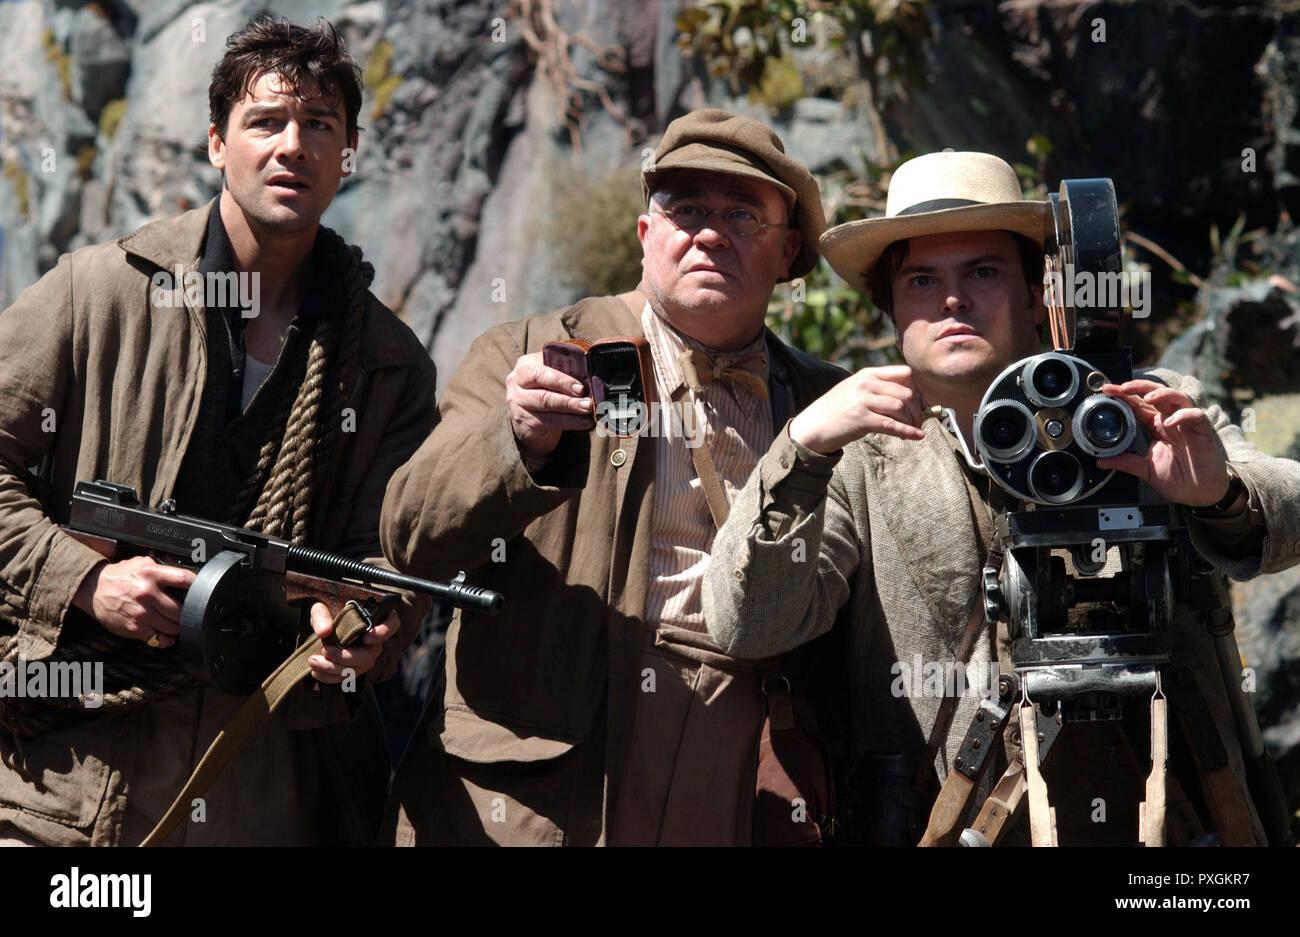 King Kong 2005 Regie Peter Jackson A Film Crew Filming A